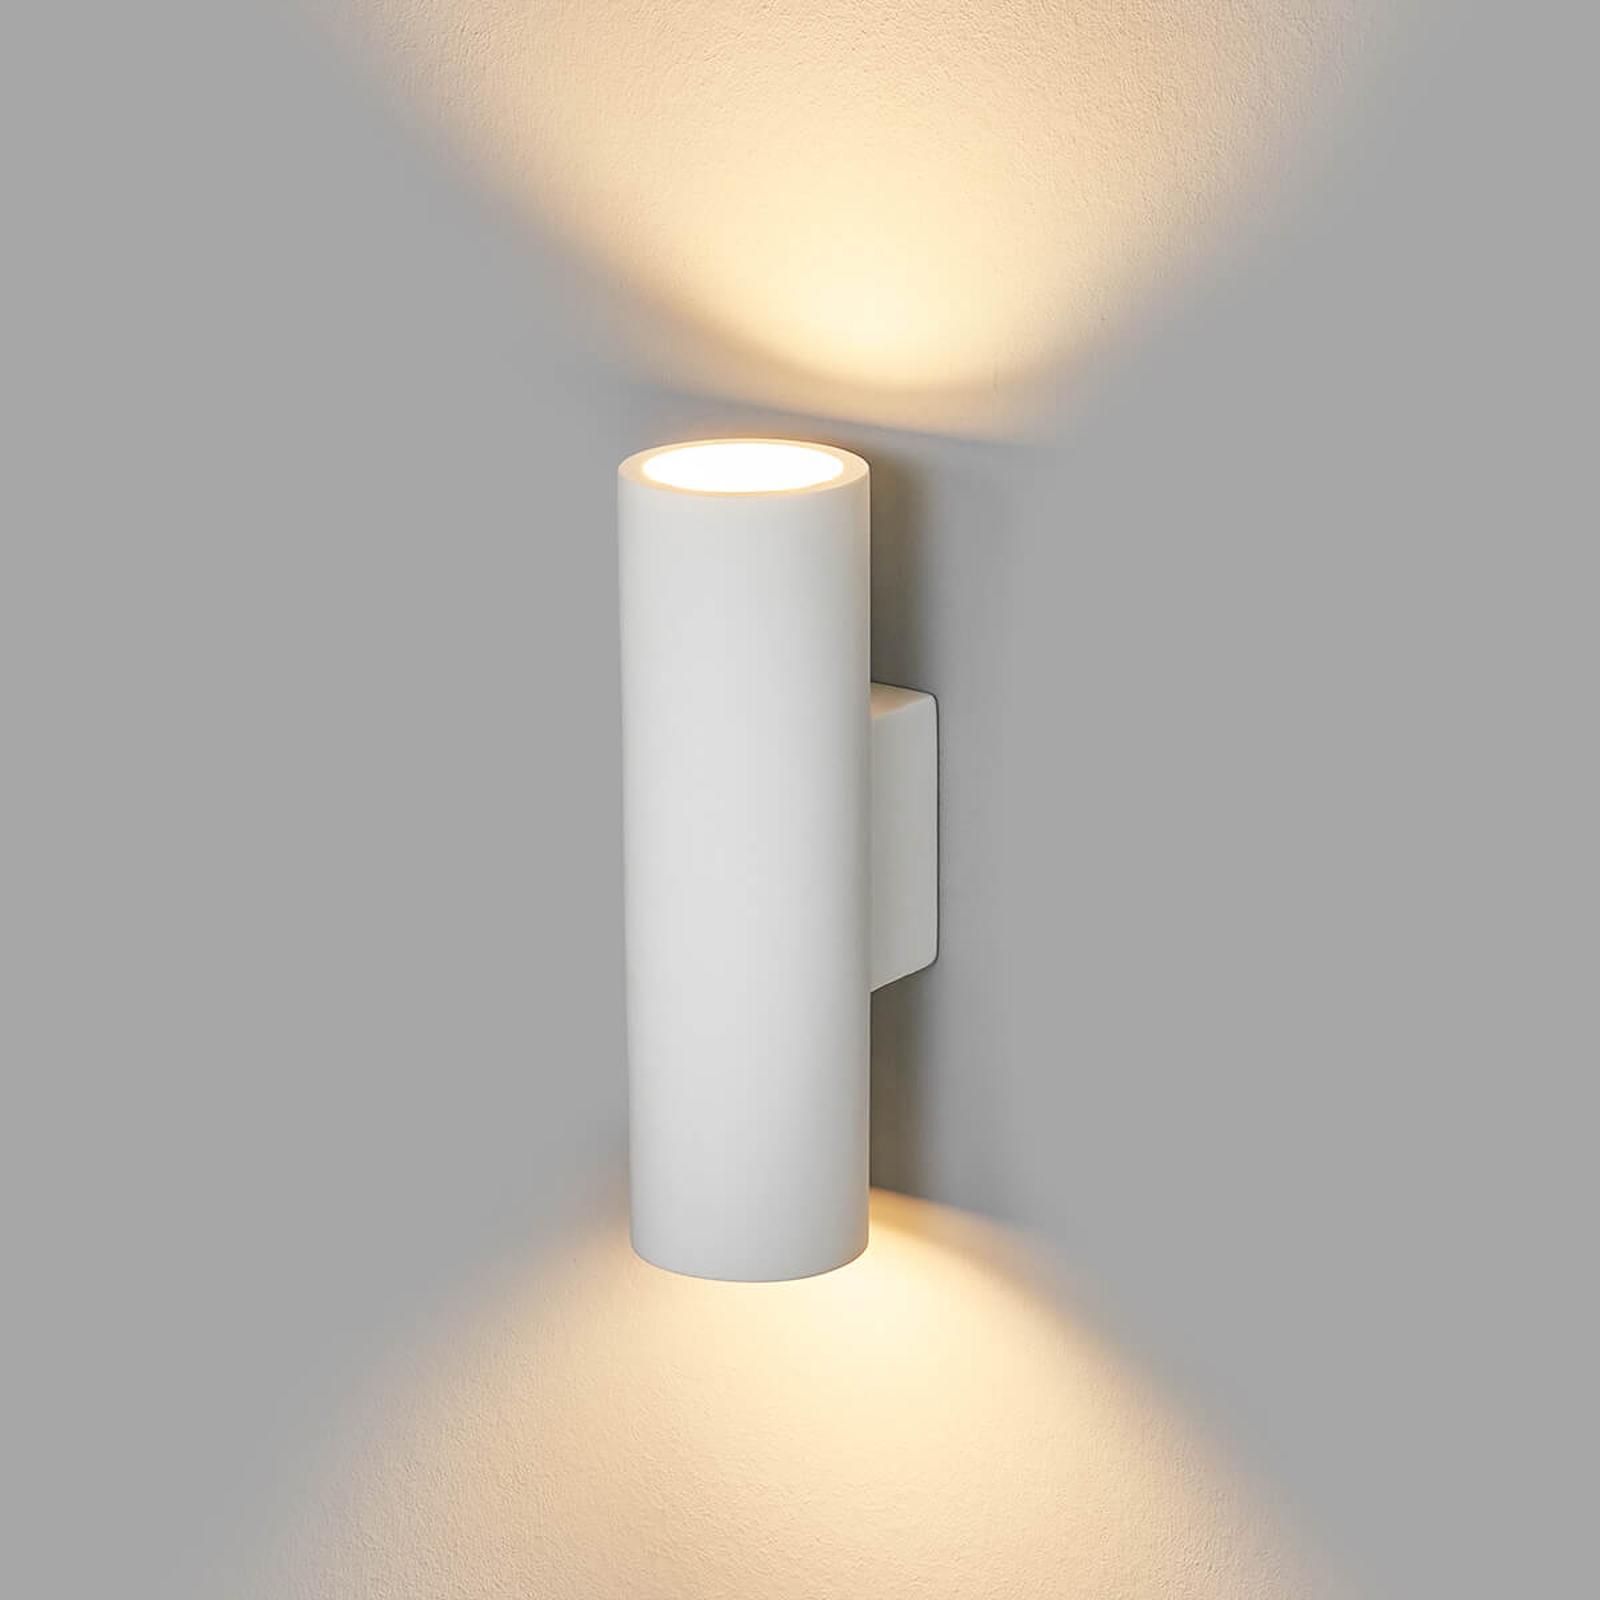 Gips wandlamp Norwin met 2 lichtbronnen